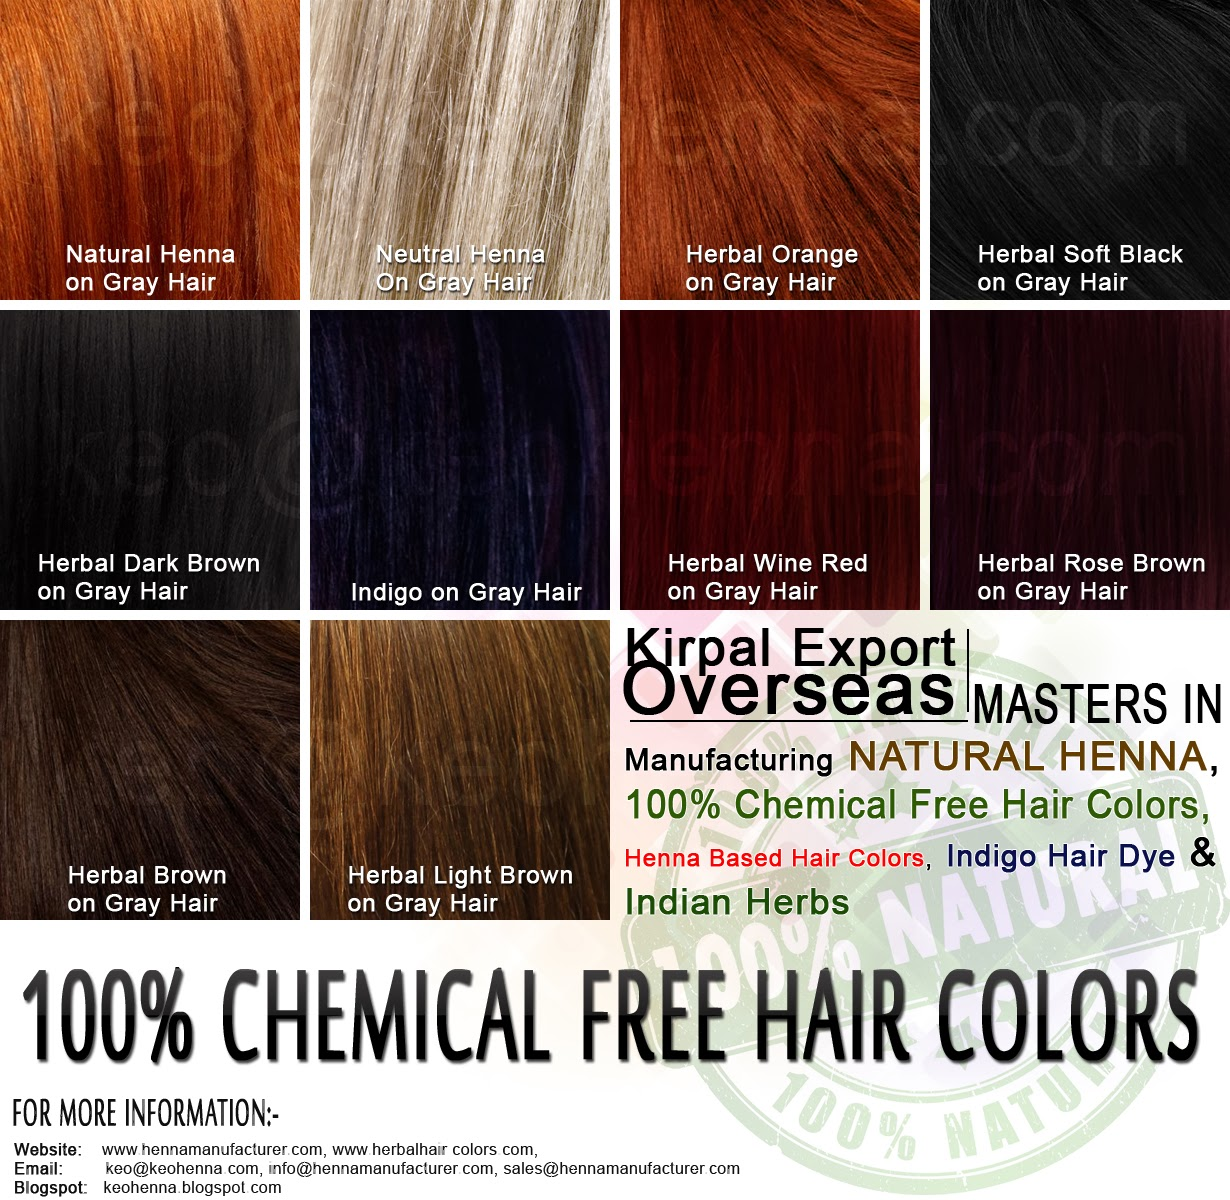 Kirpal Export Overseas Natural Henna Manufacturers Herbal Hair